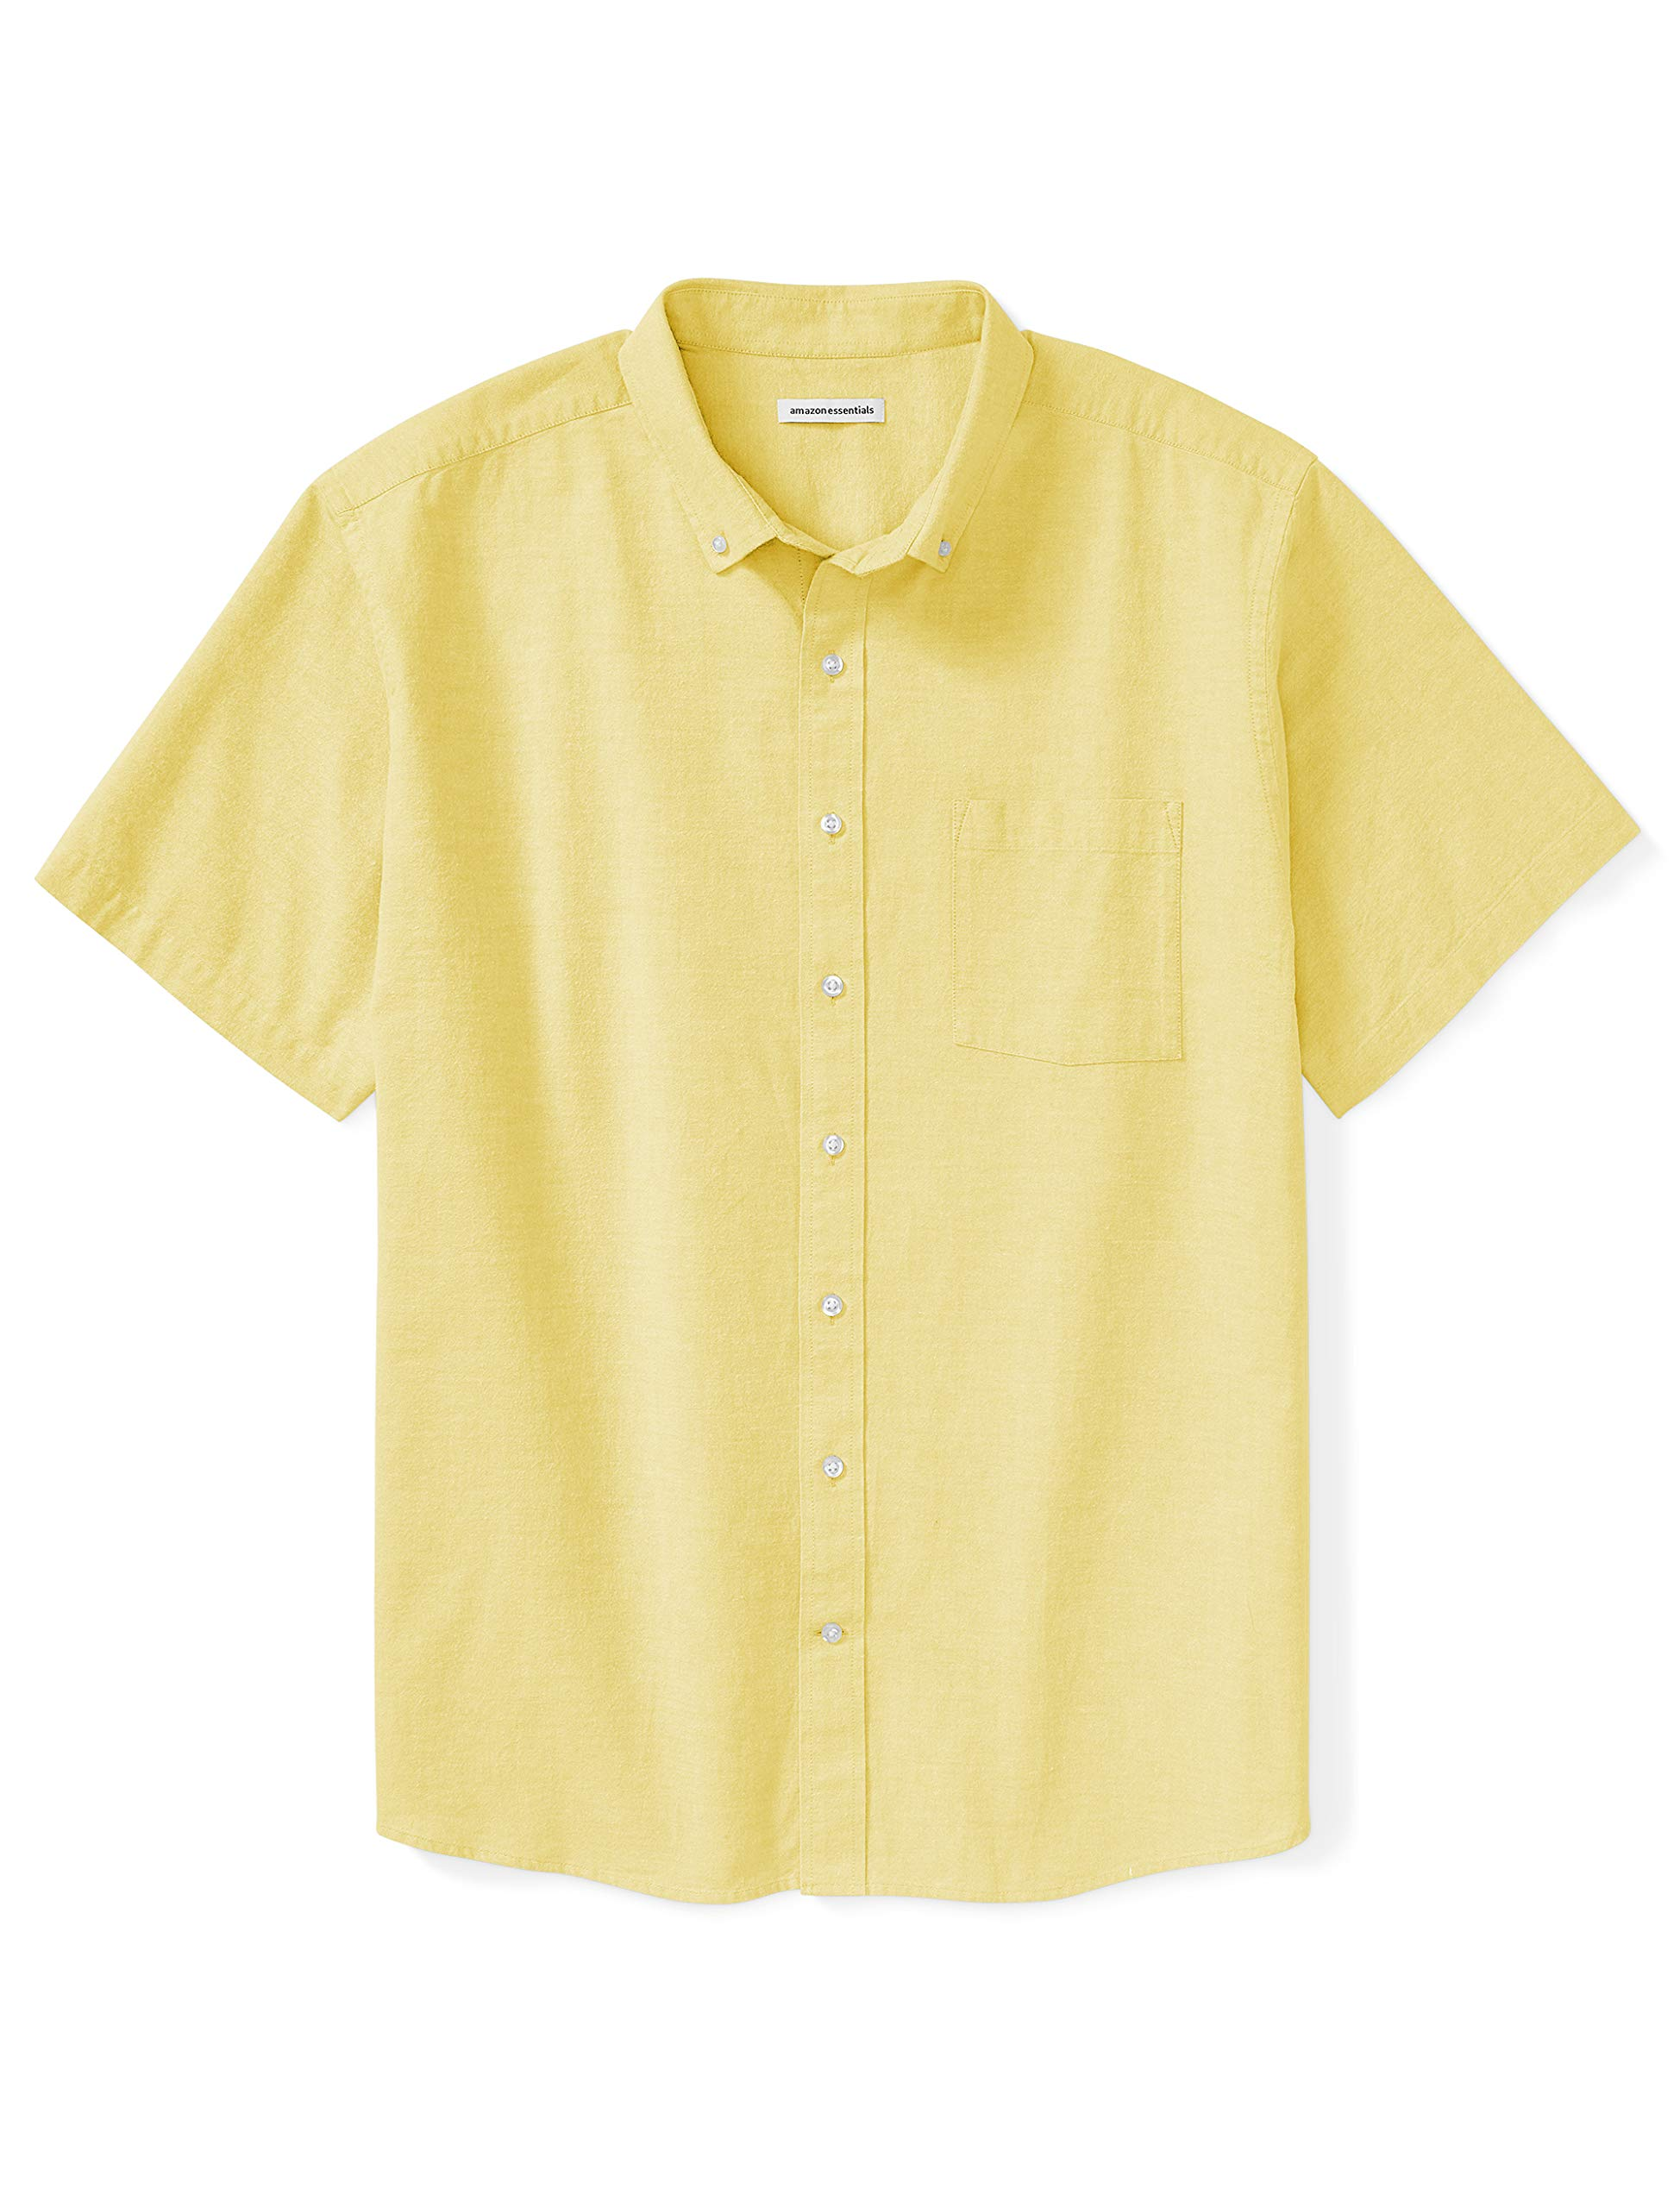 Amazon Essentials Men's Short-Sleeve Pocket Oxford Shirt fit by DXL